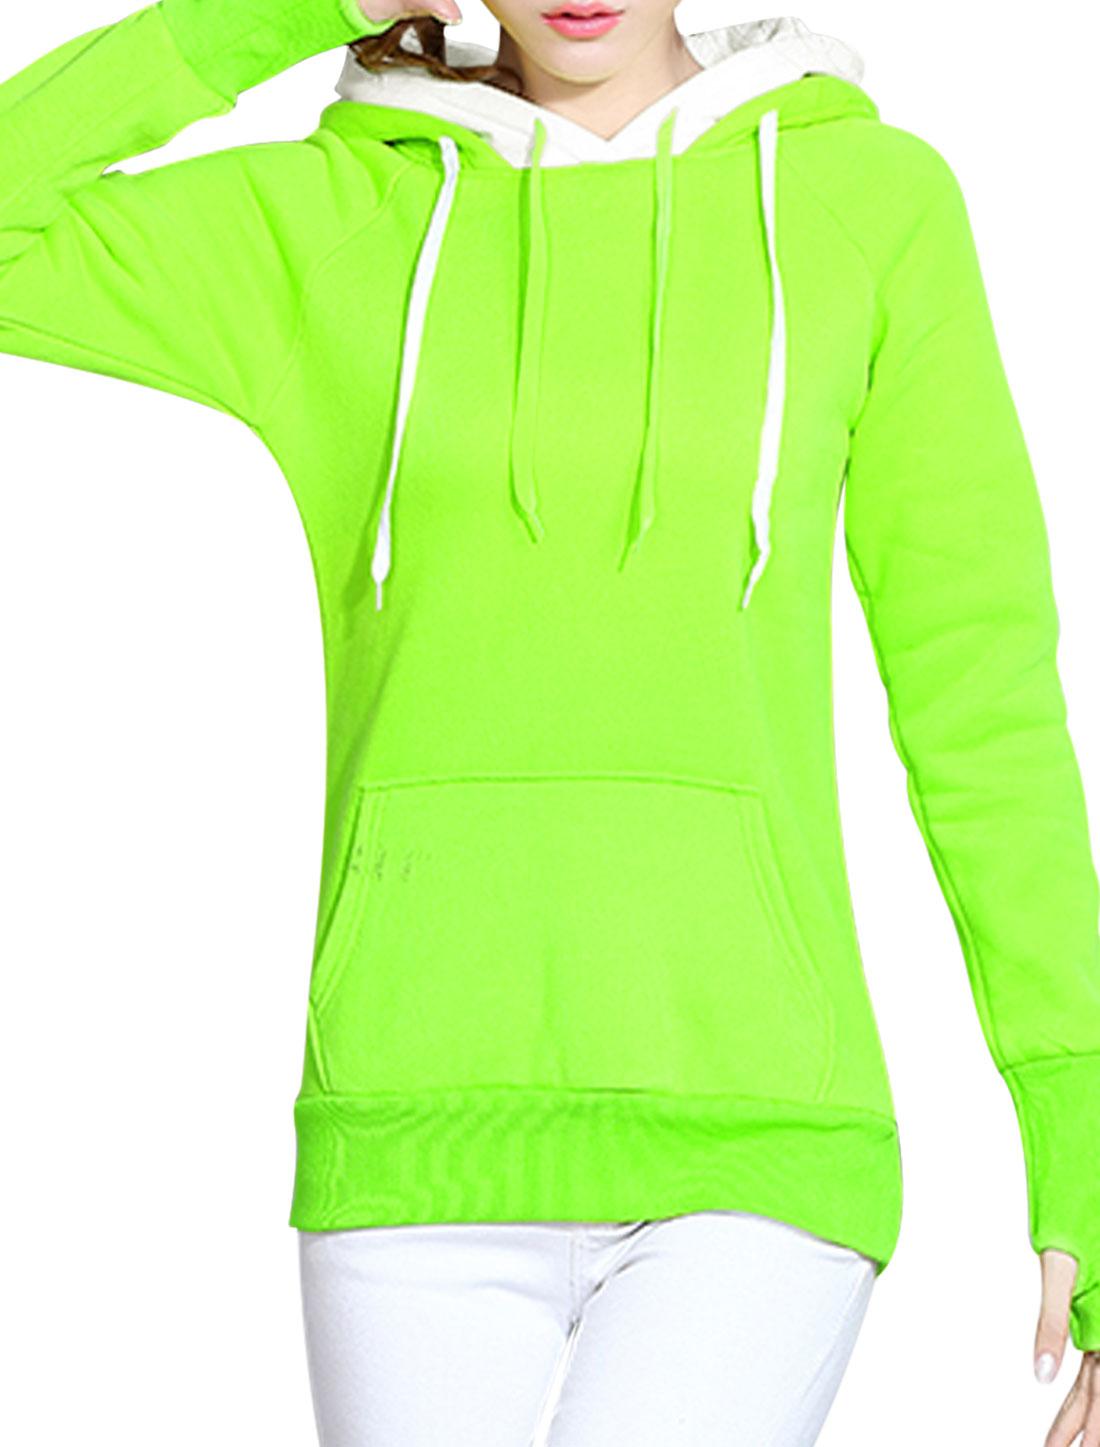 Ladies Double Layer Hooded Sweatshirt Fluorescent Green XS